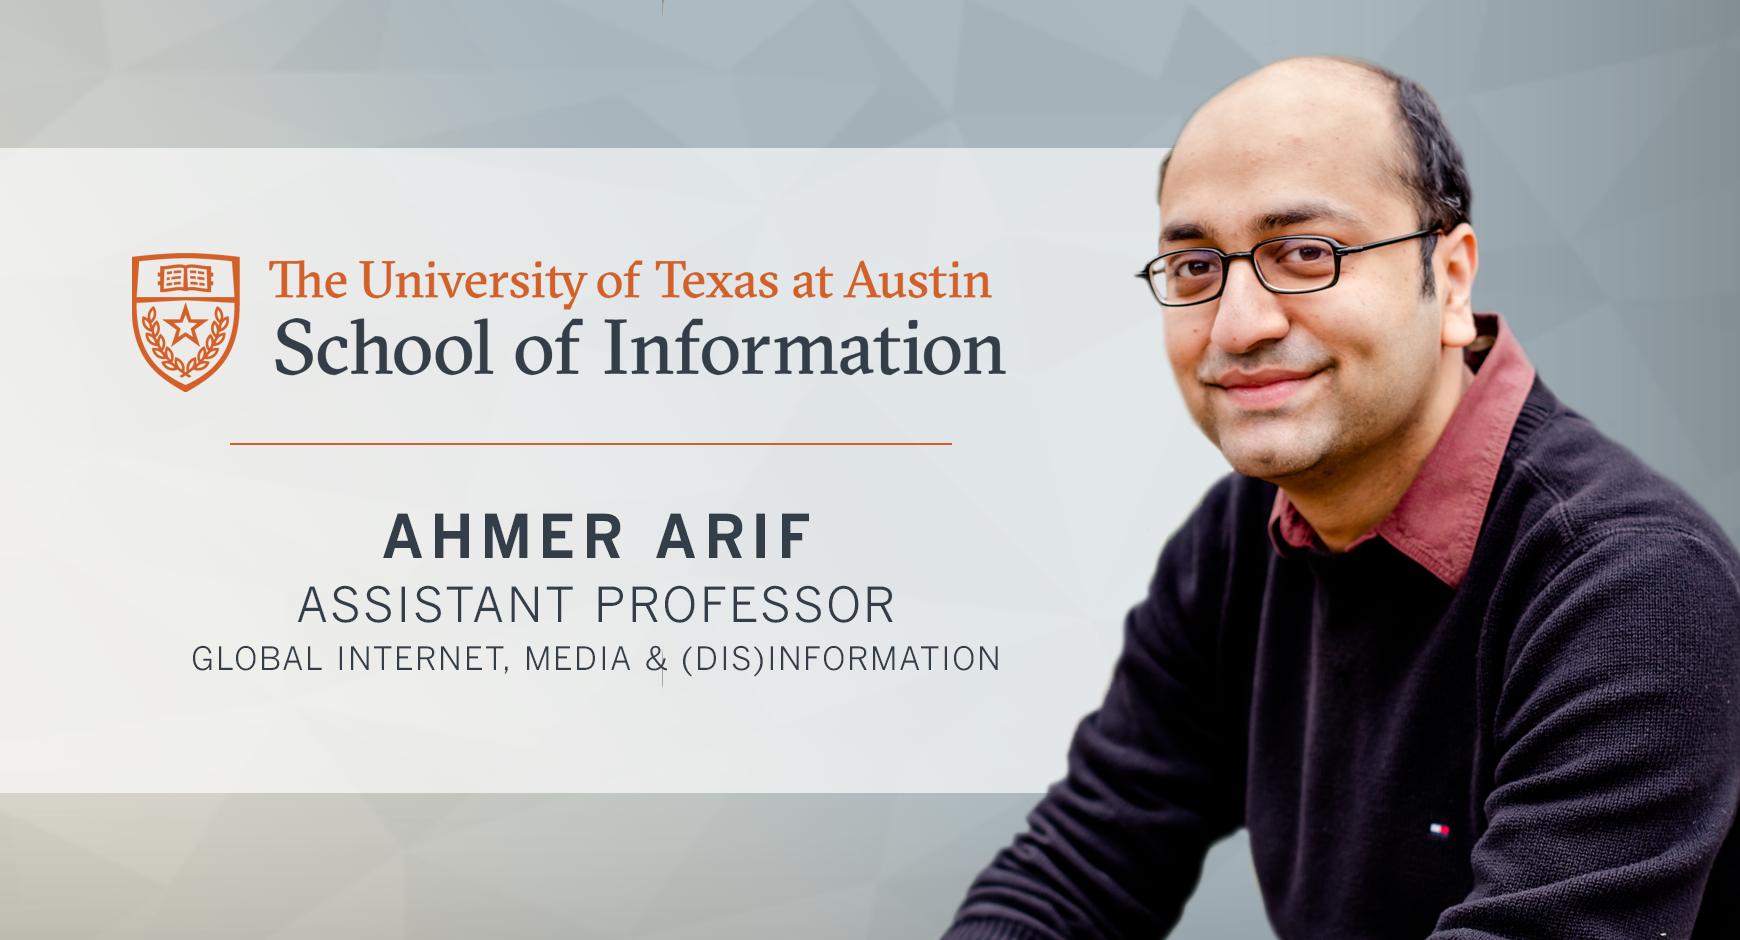 Ahmer Arif